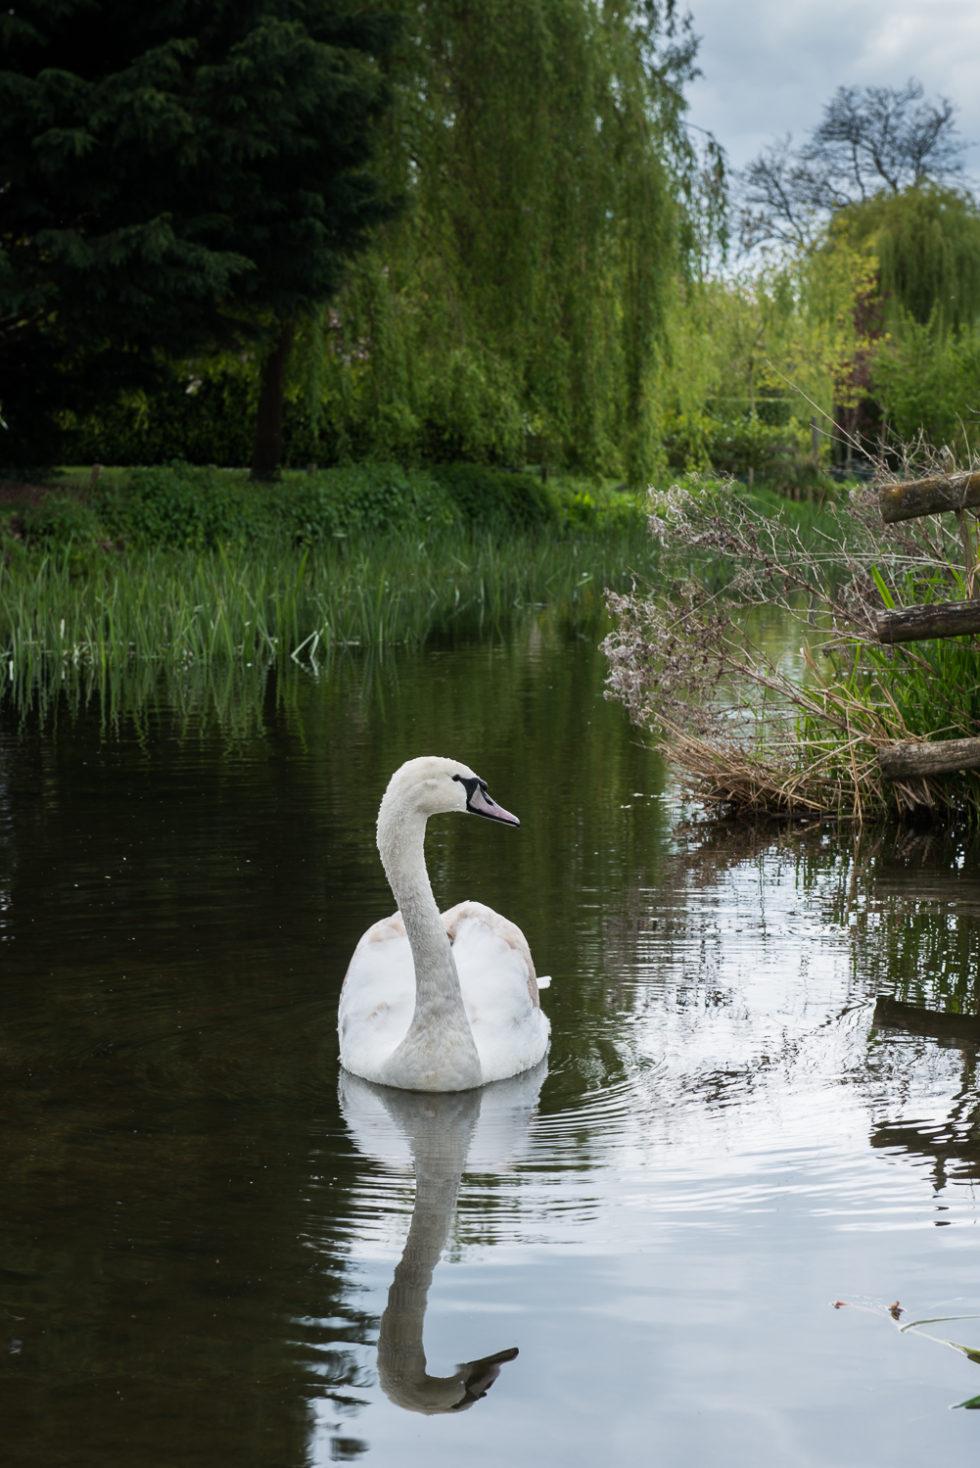 240-365v3 - The Immature Swan